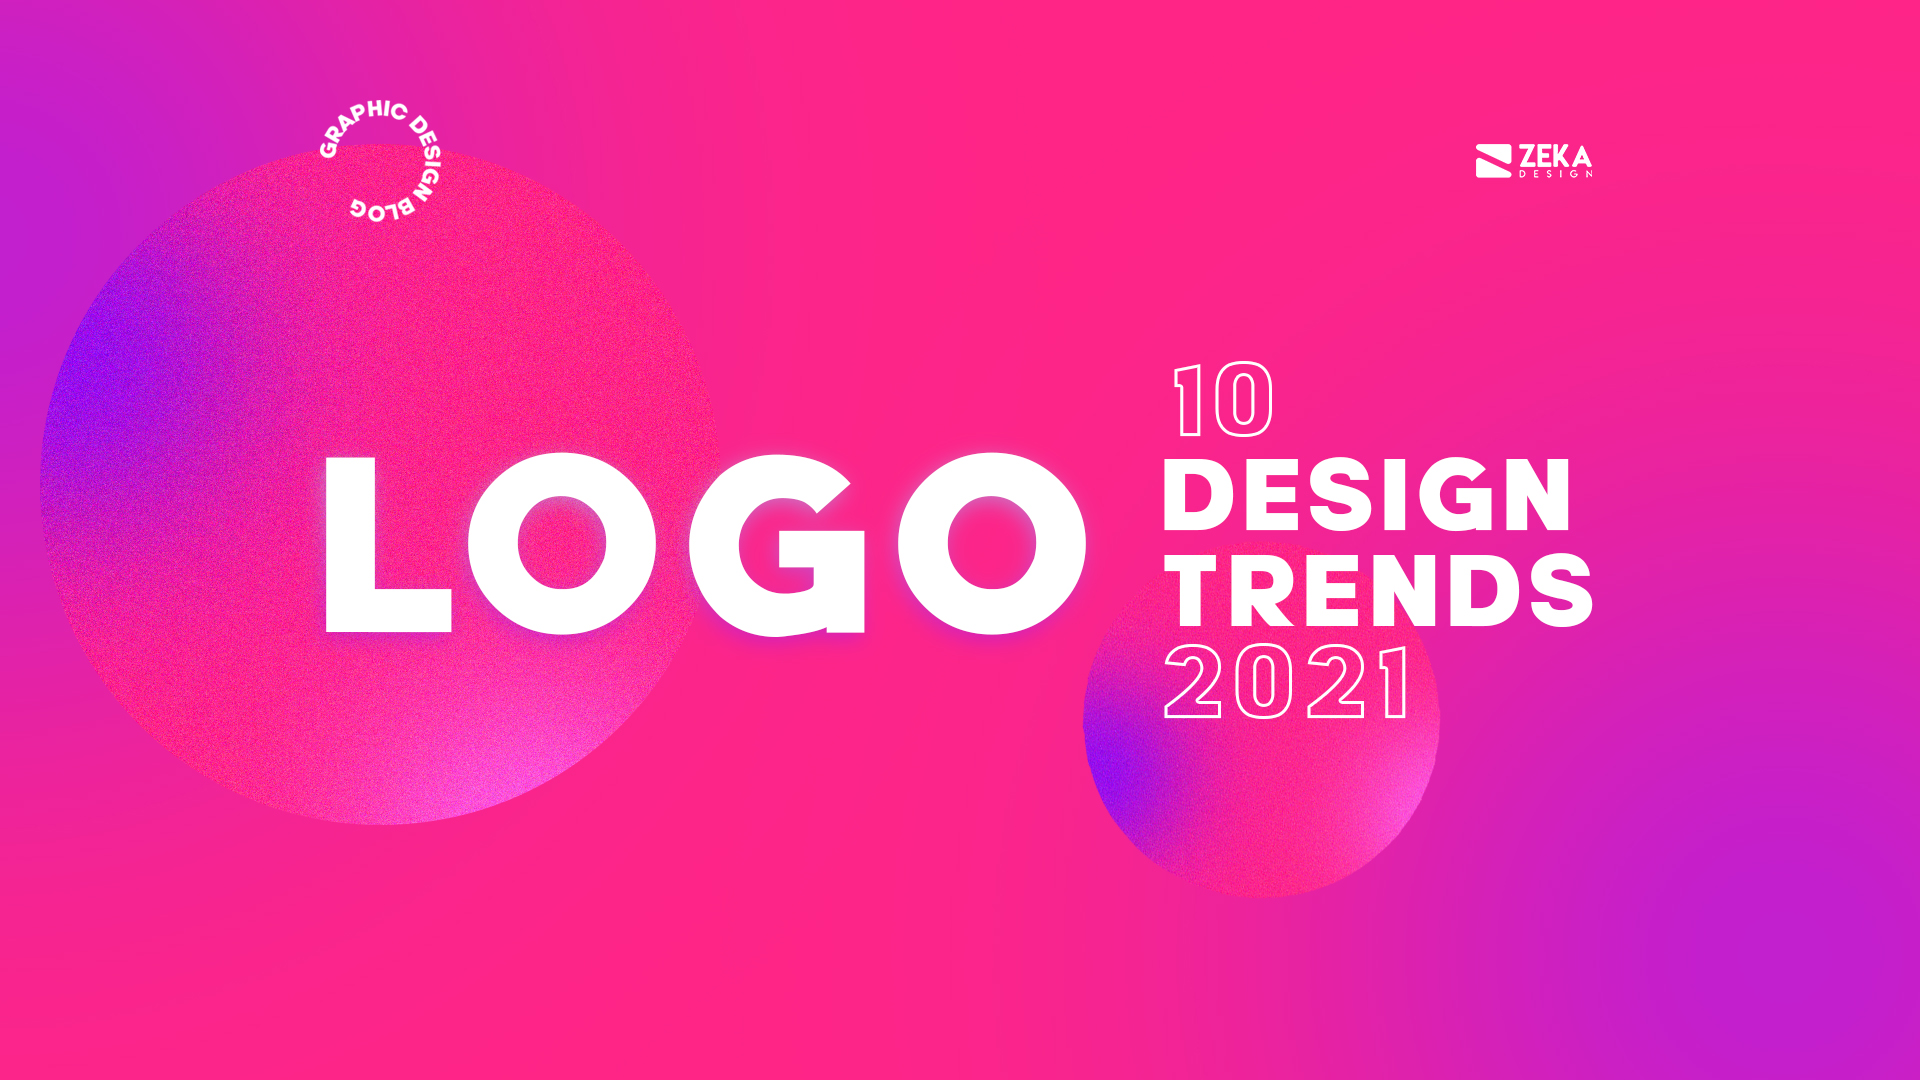 10 Logo Design Trends for 2021 Graphic Design Inspiration